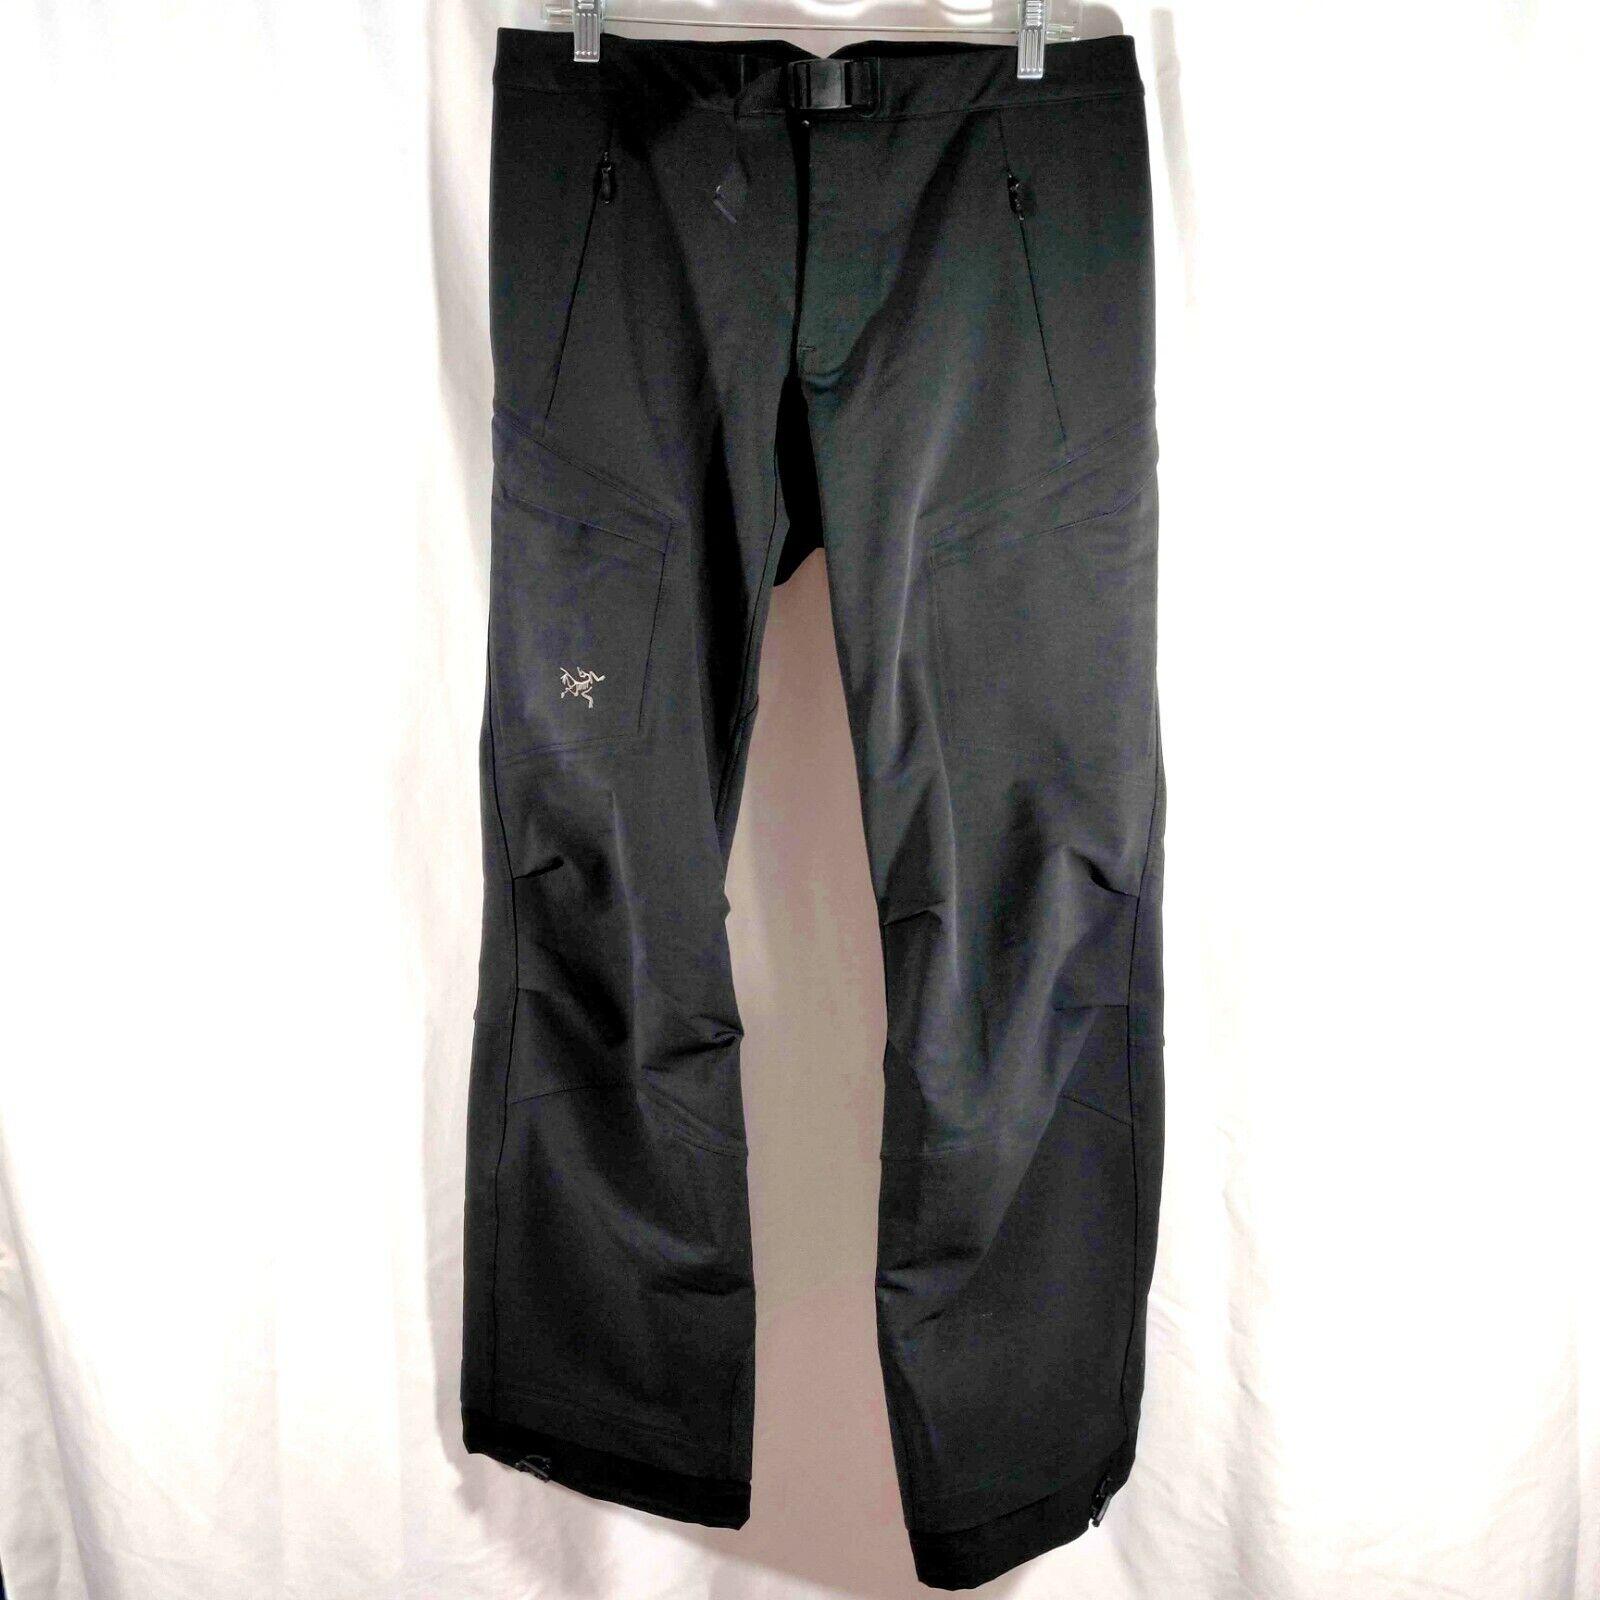 ARC'TERYX Womannens Snowboard Skipants 12 Reg GoreTex Lined Pockets Belted Groot